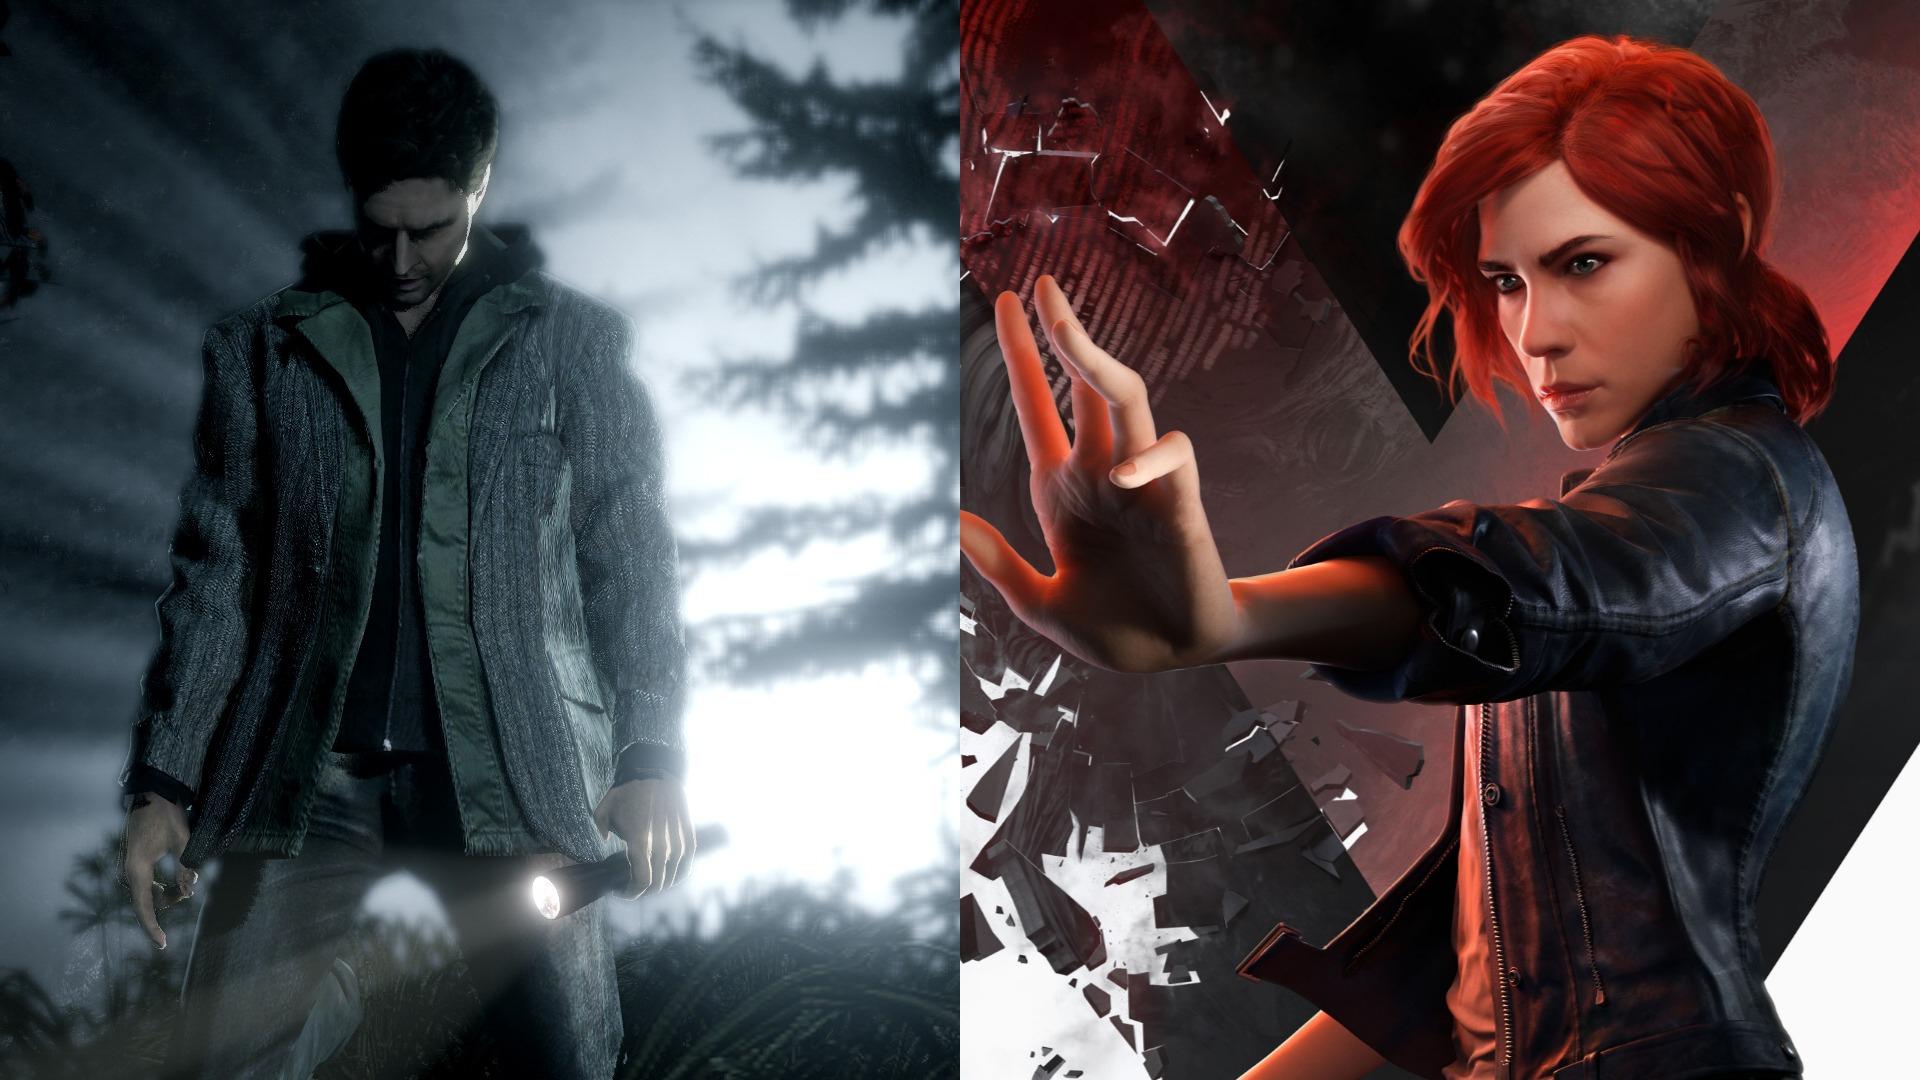 「Remedy宇宙」正式公開 《控制》新DLC是計劃第一步